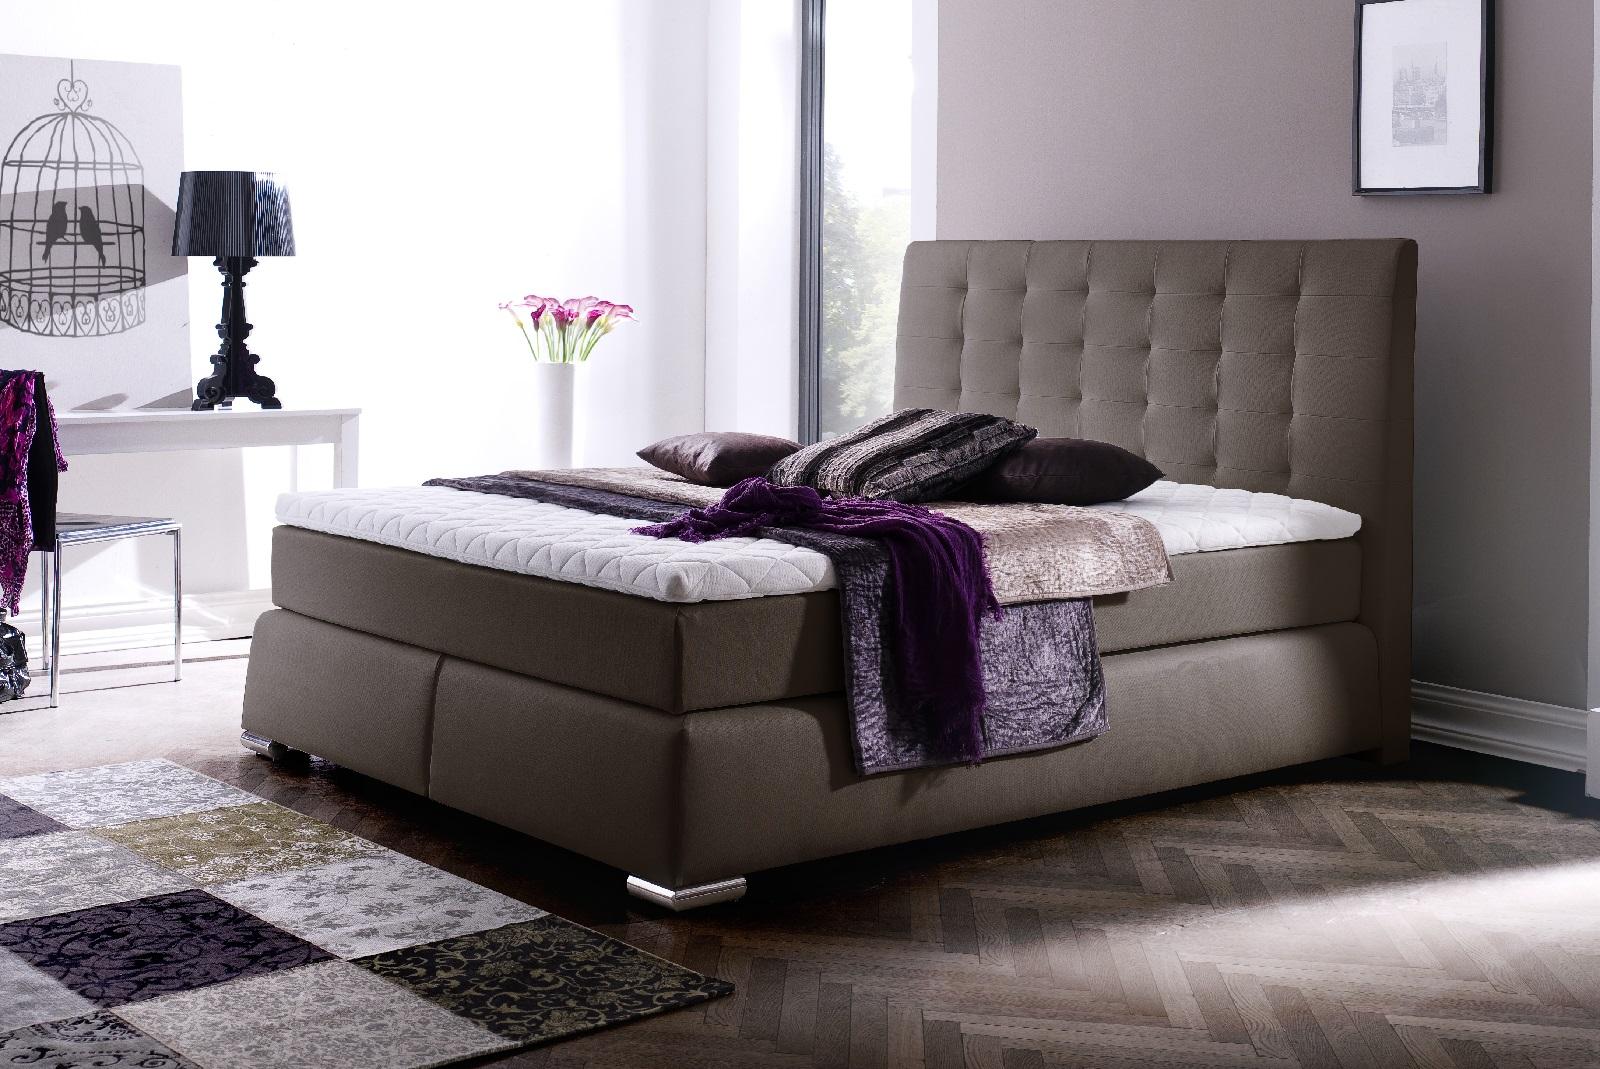 boxspringbett claudine braun 160cm x 200cm. Black Bedroom Furniture Sets. Home Design Ideas